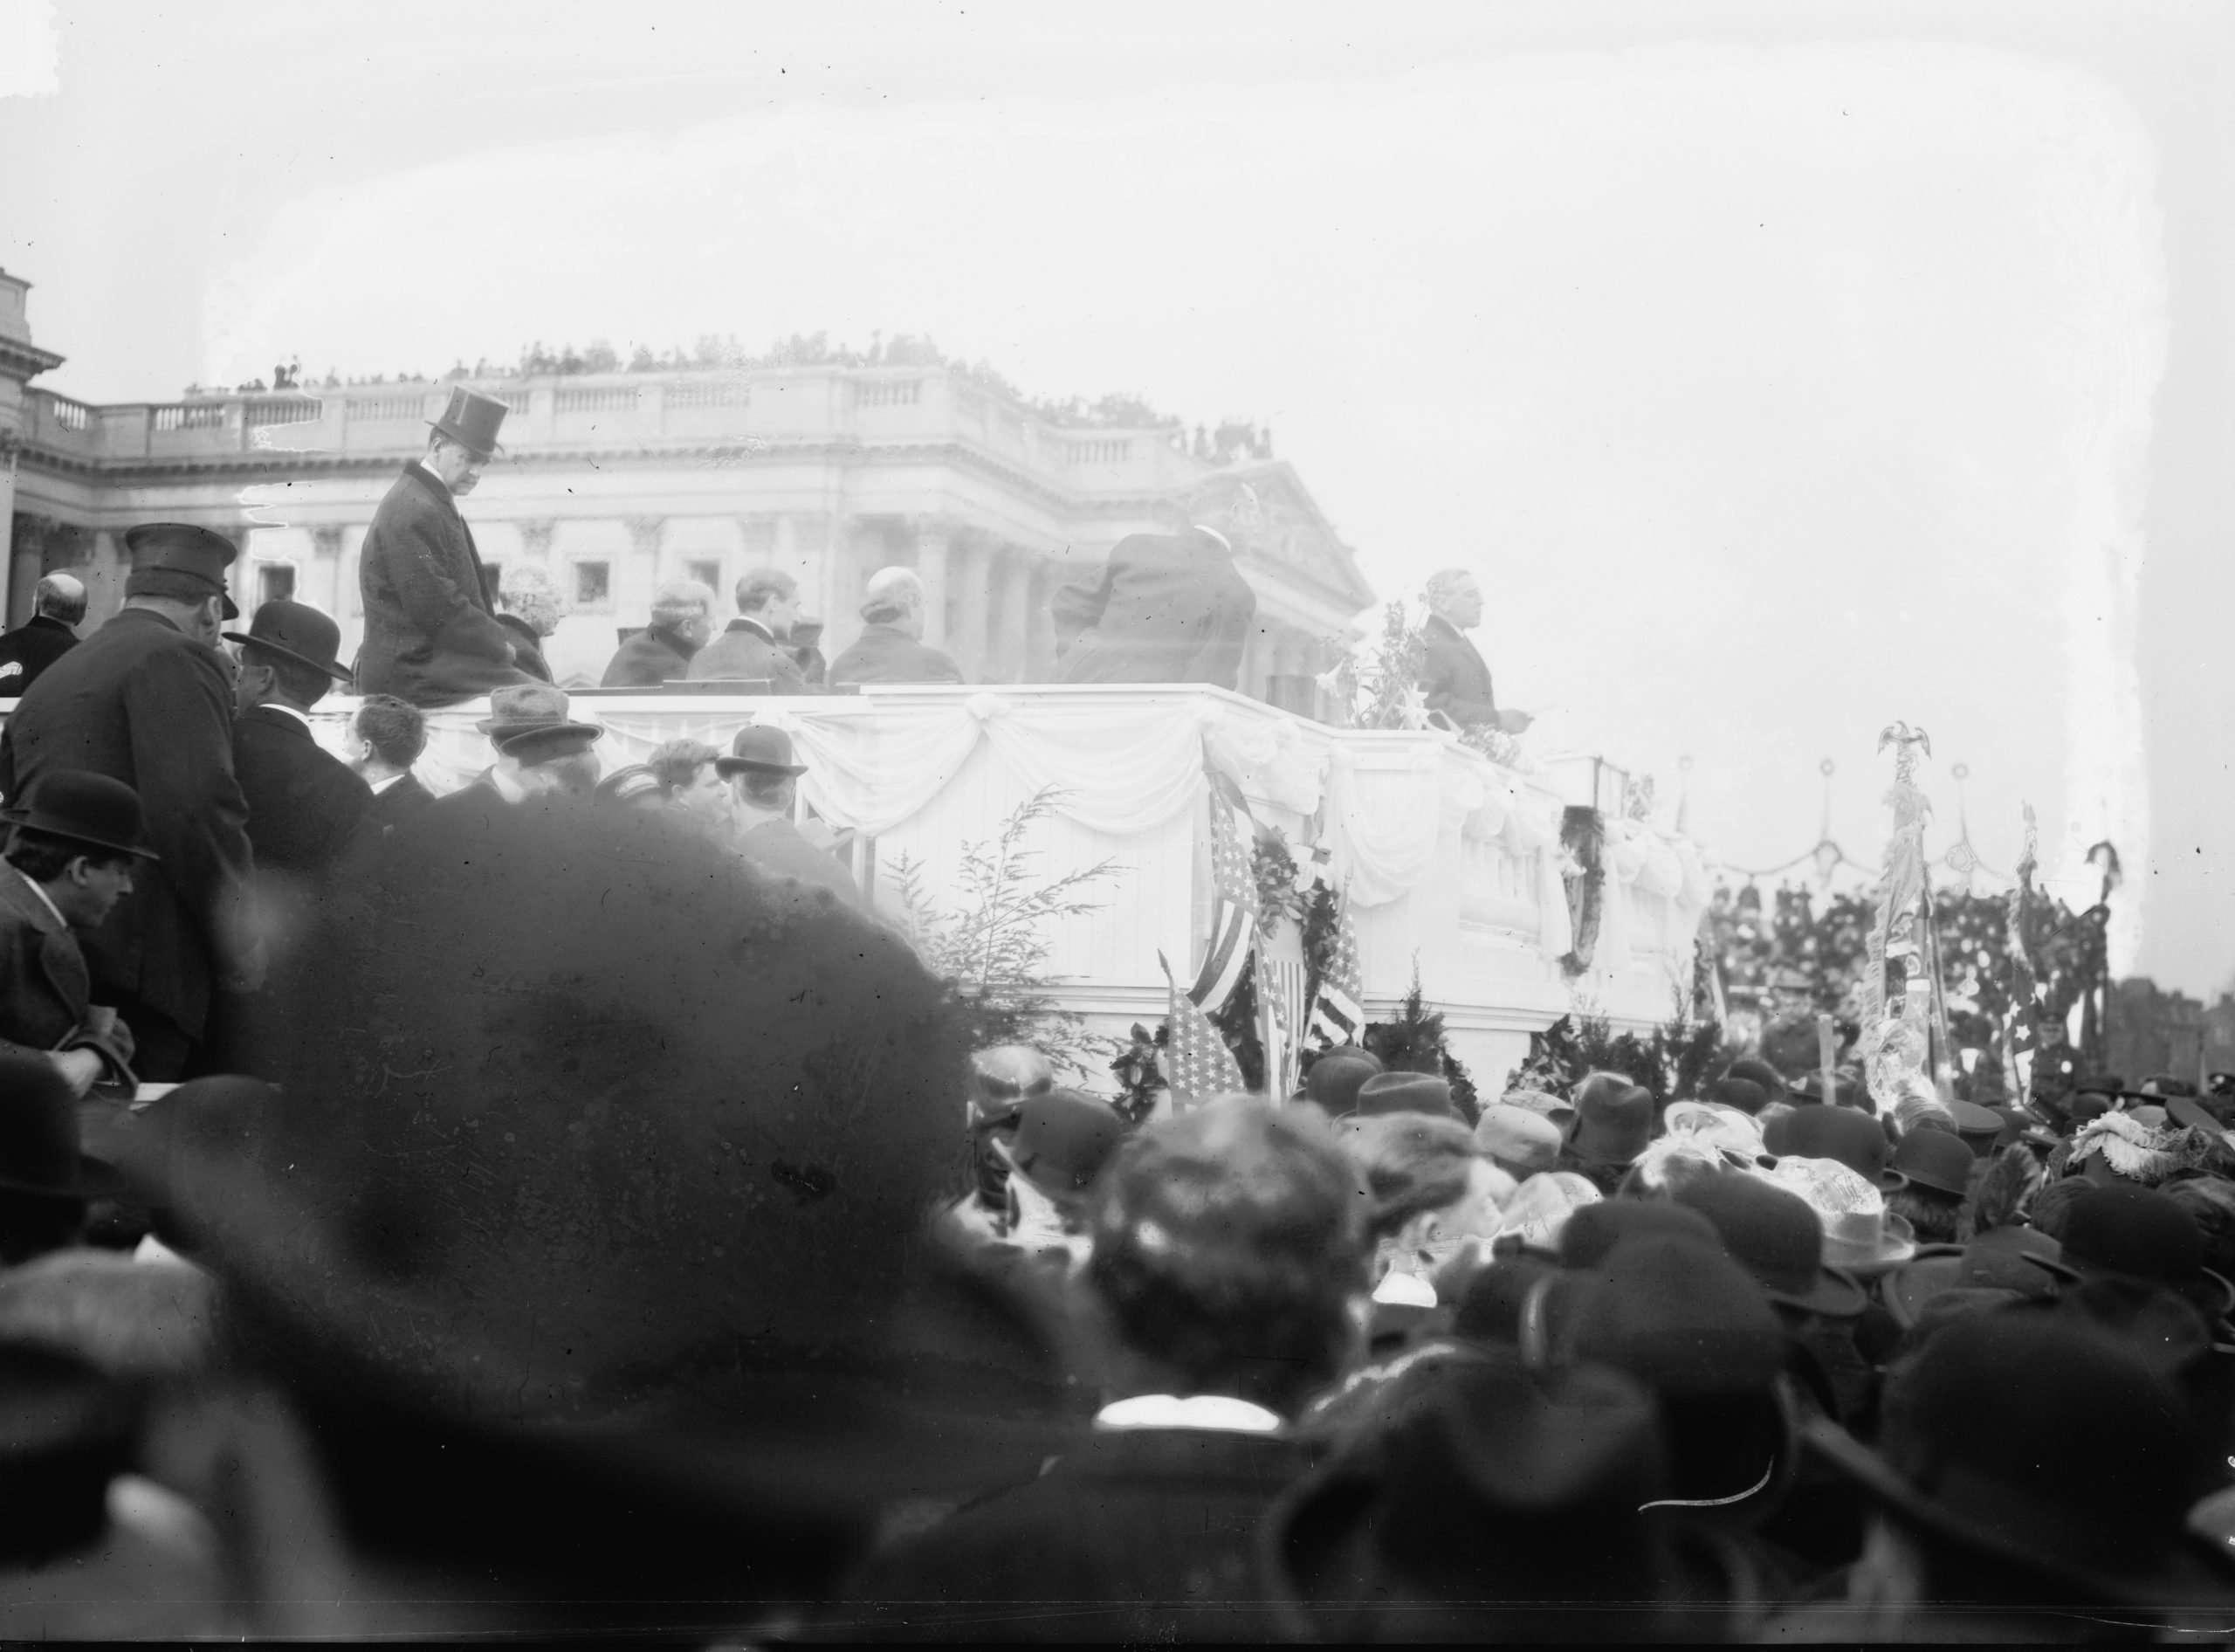 President Wilson's First Inaugural Address